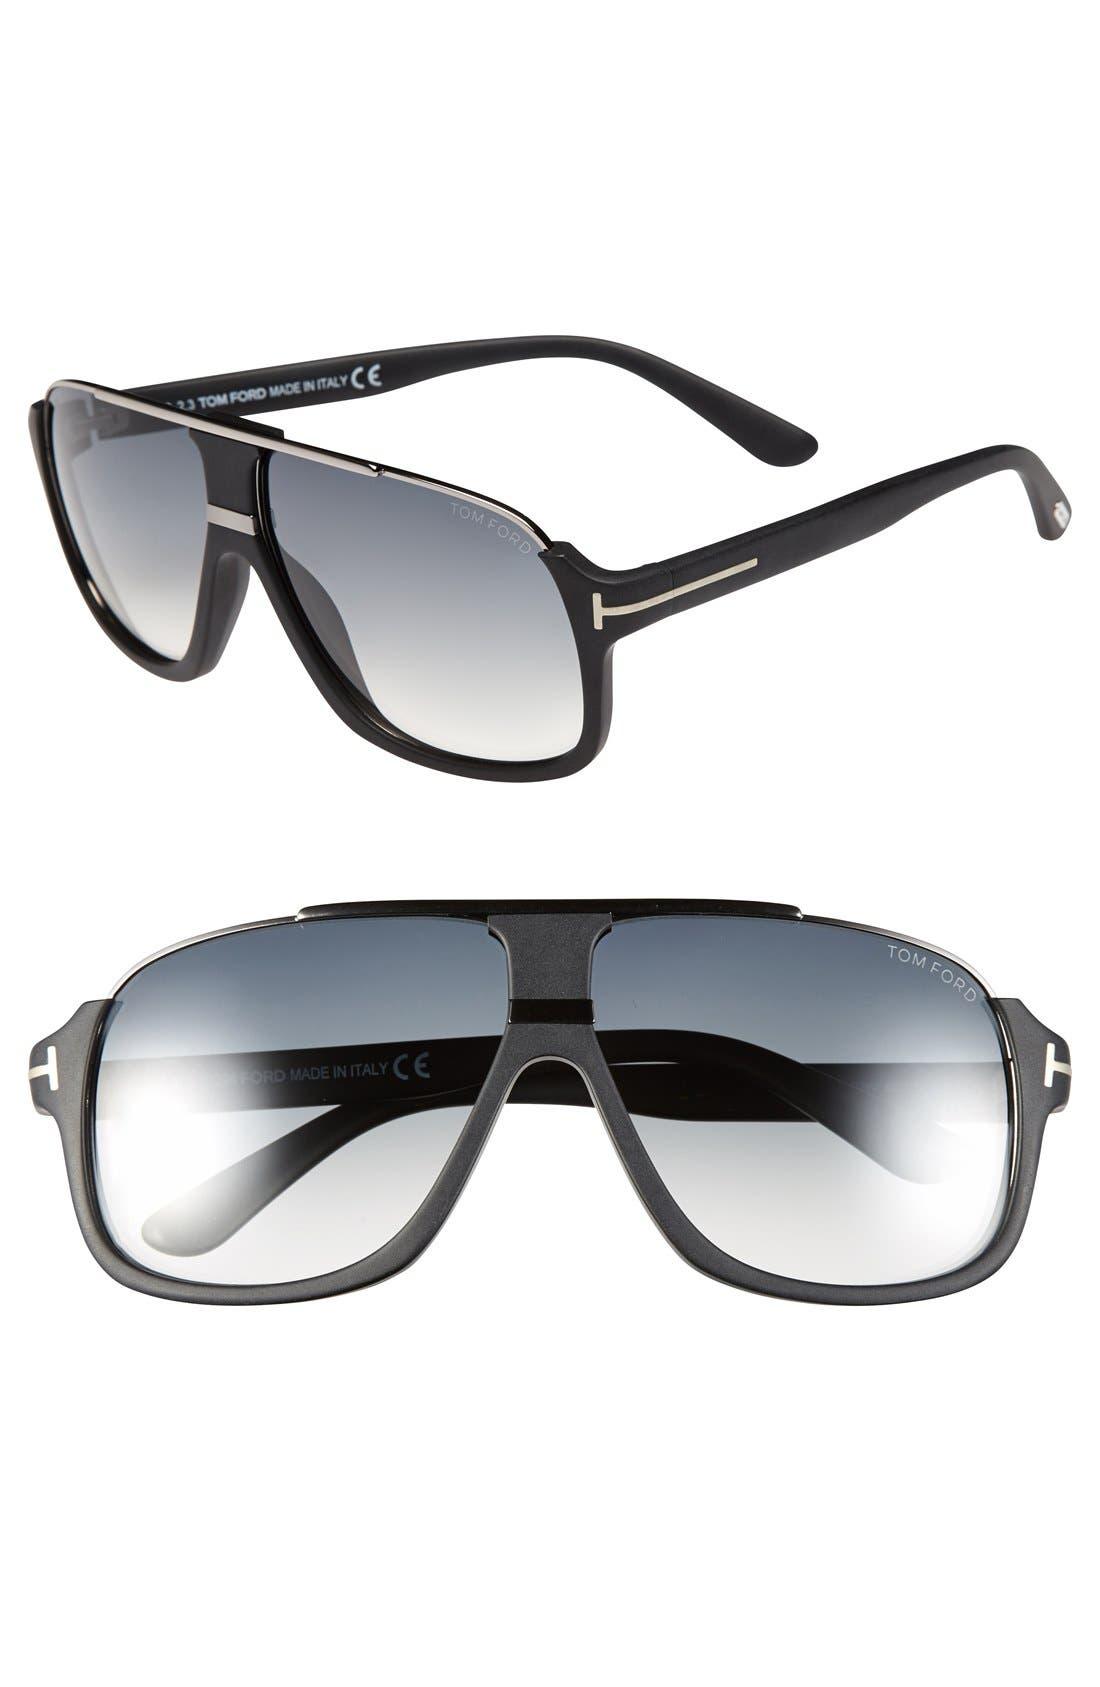 Main Image - Tom Ford 'Eliot' 60mm Sunglasses